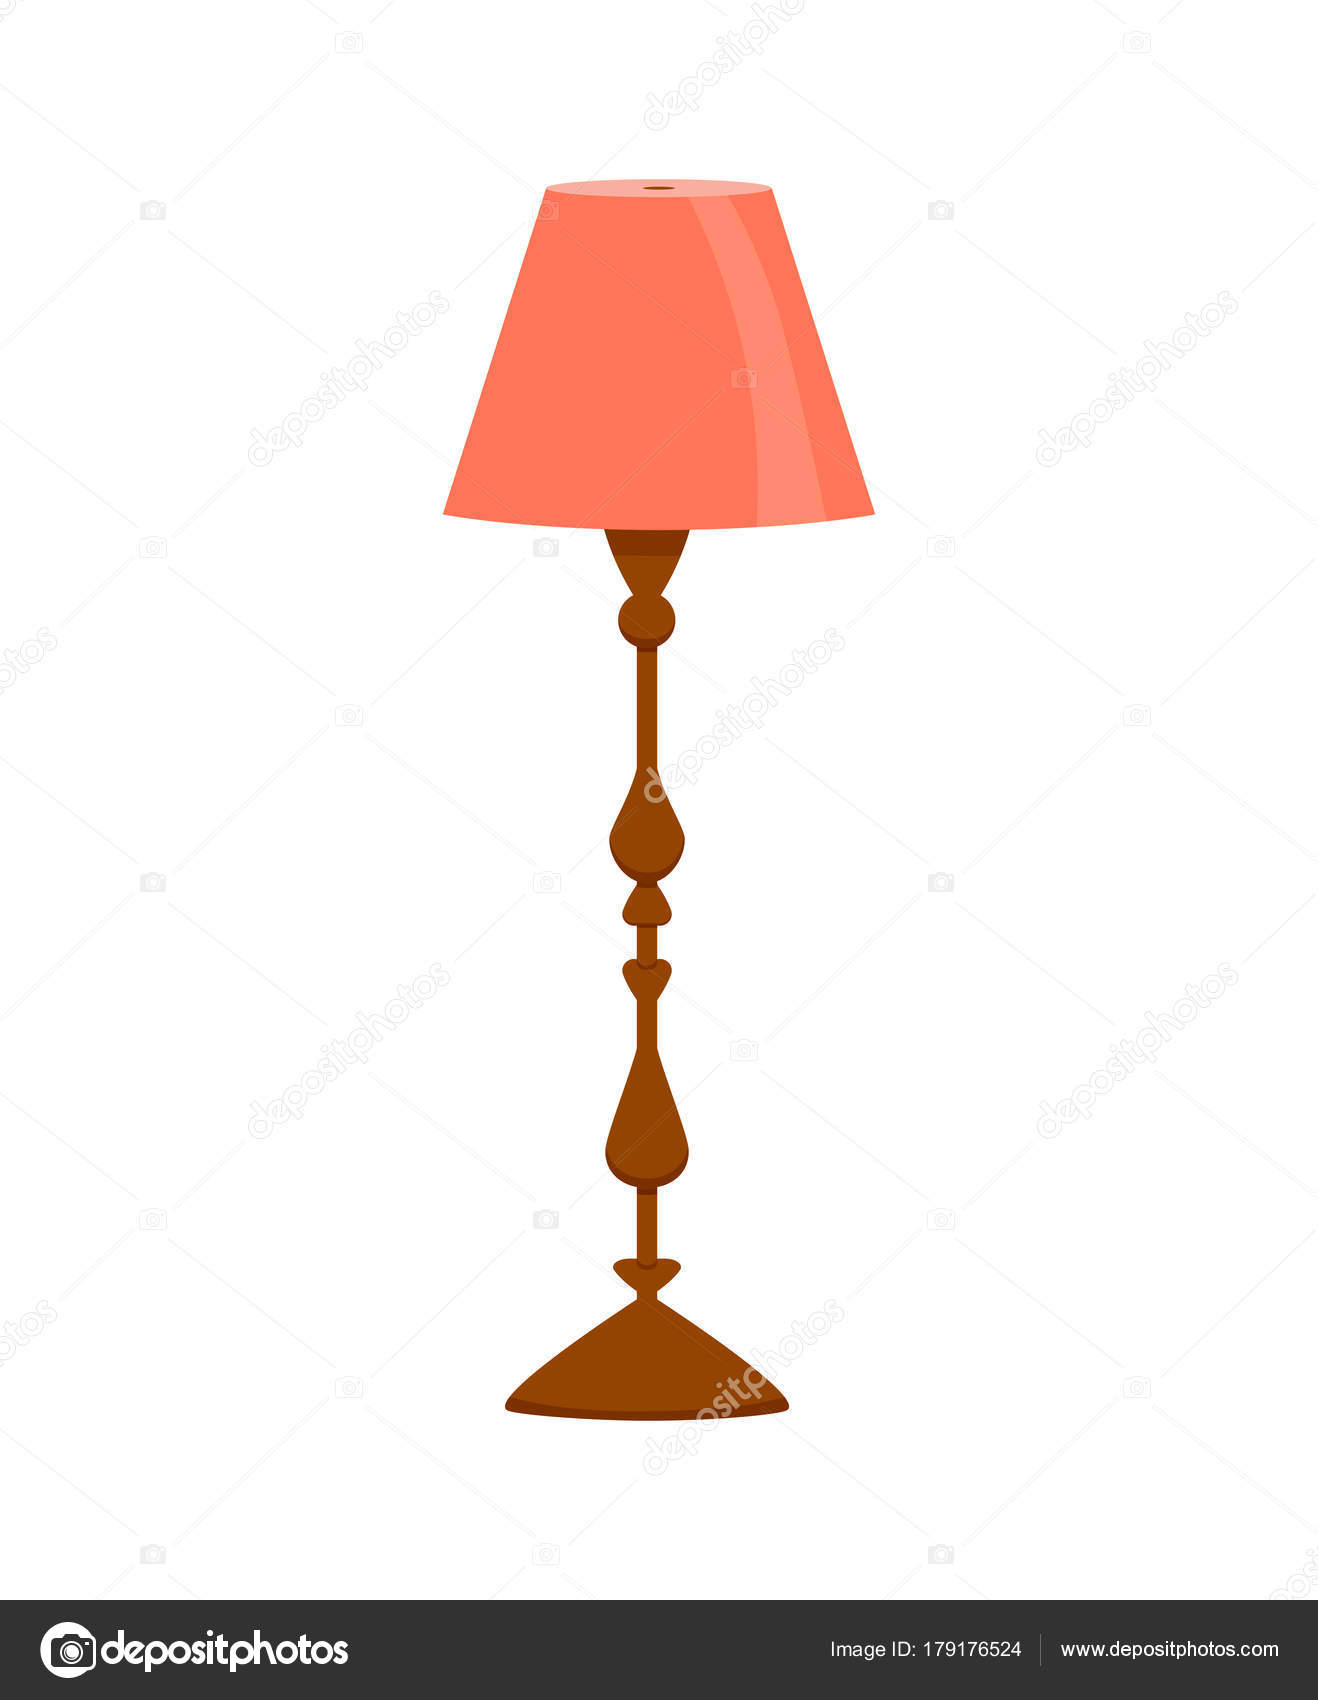 Set of colorful cartoon floor lamps light — Stock Vector © Oligliya ... for tall lamp clipart  166kxo